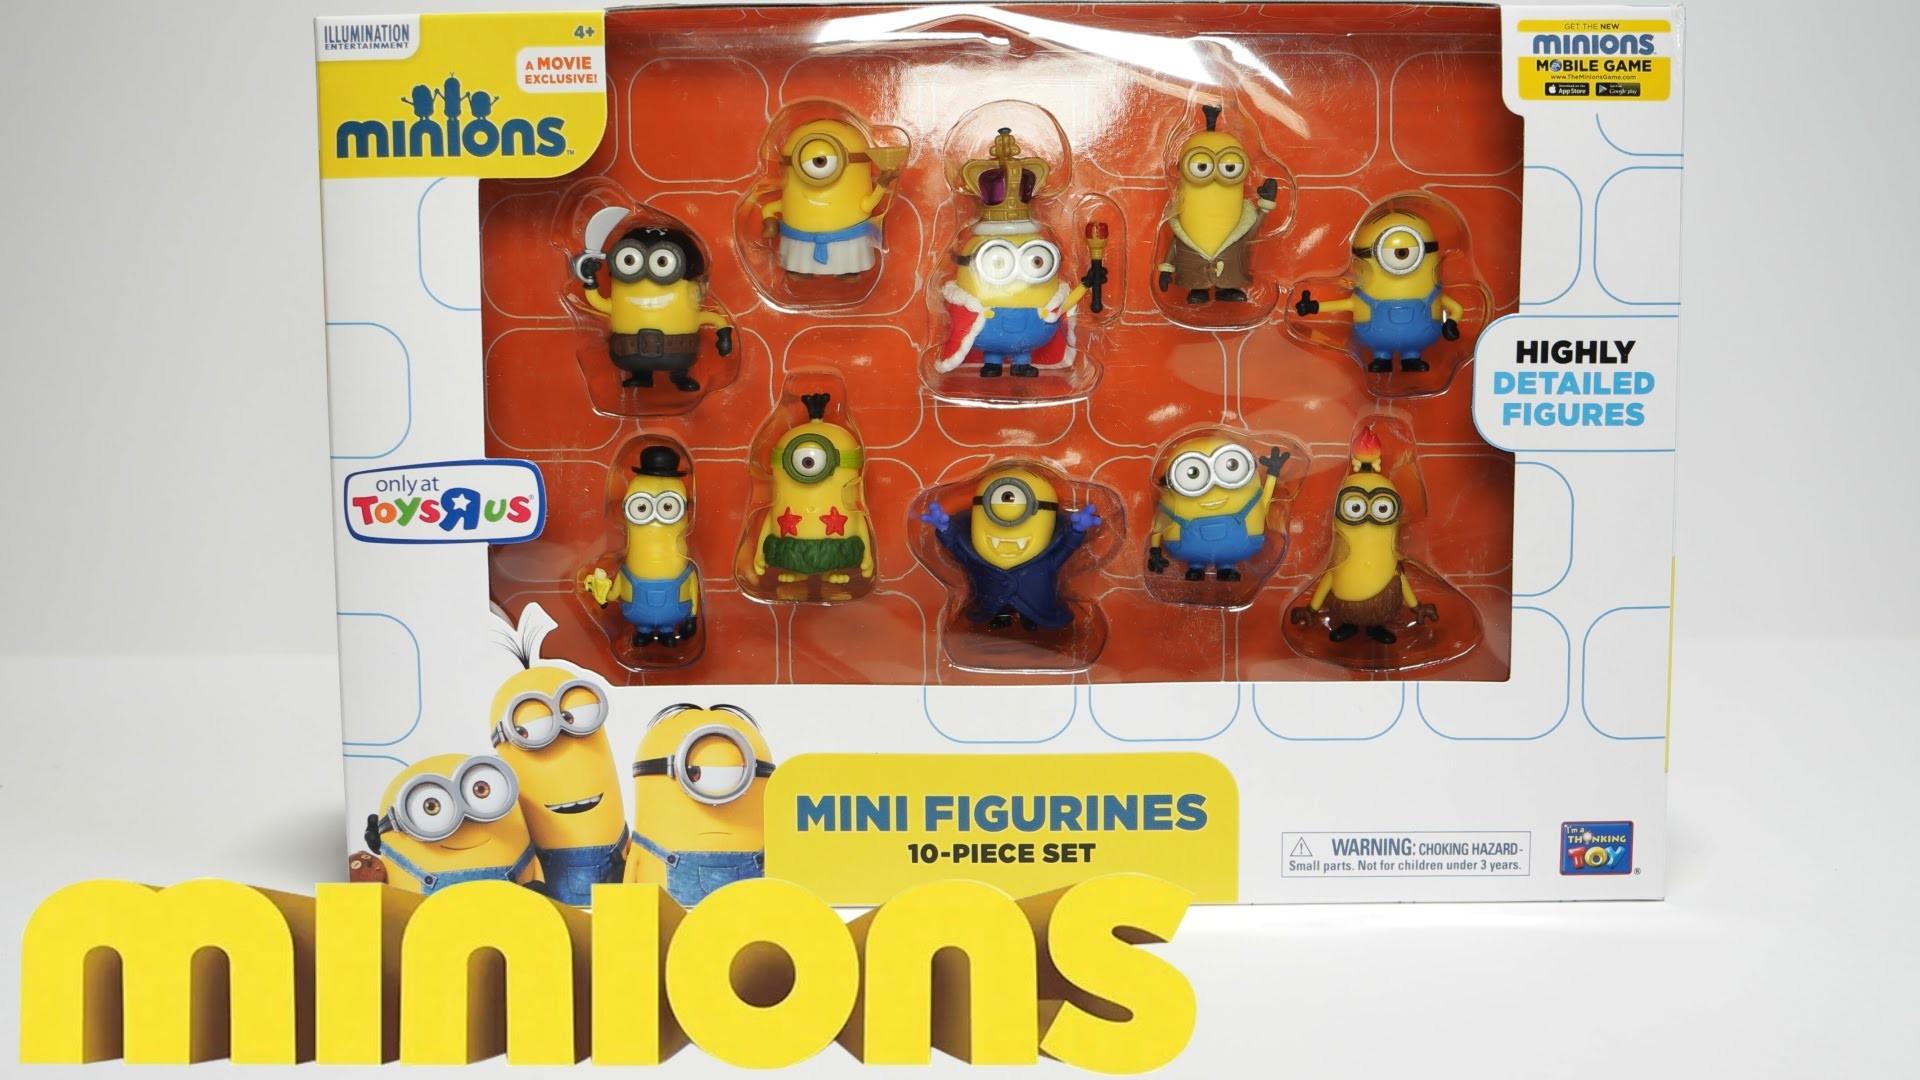 MINI FIGURINES 10 PIECE SET – New 2015 Minions Movie Exclusive Toys –  YouTube